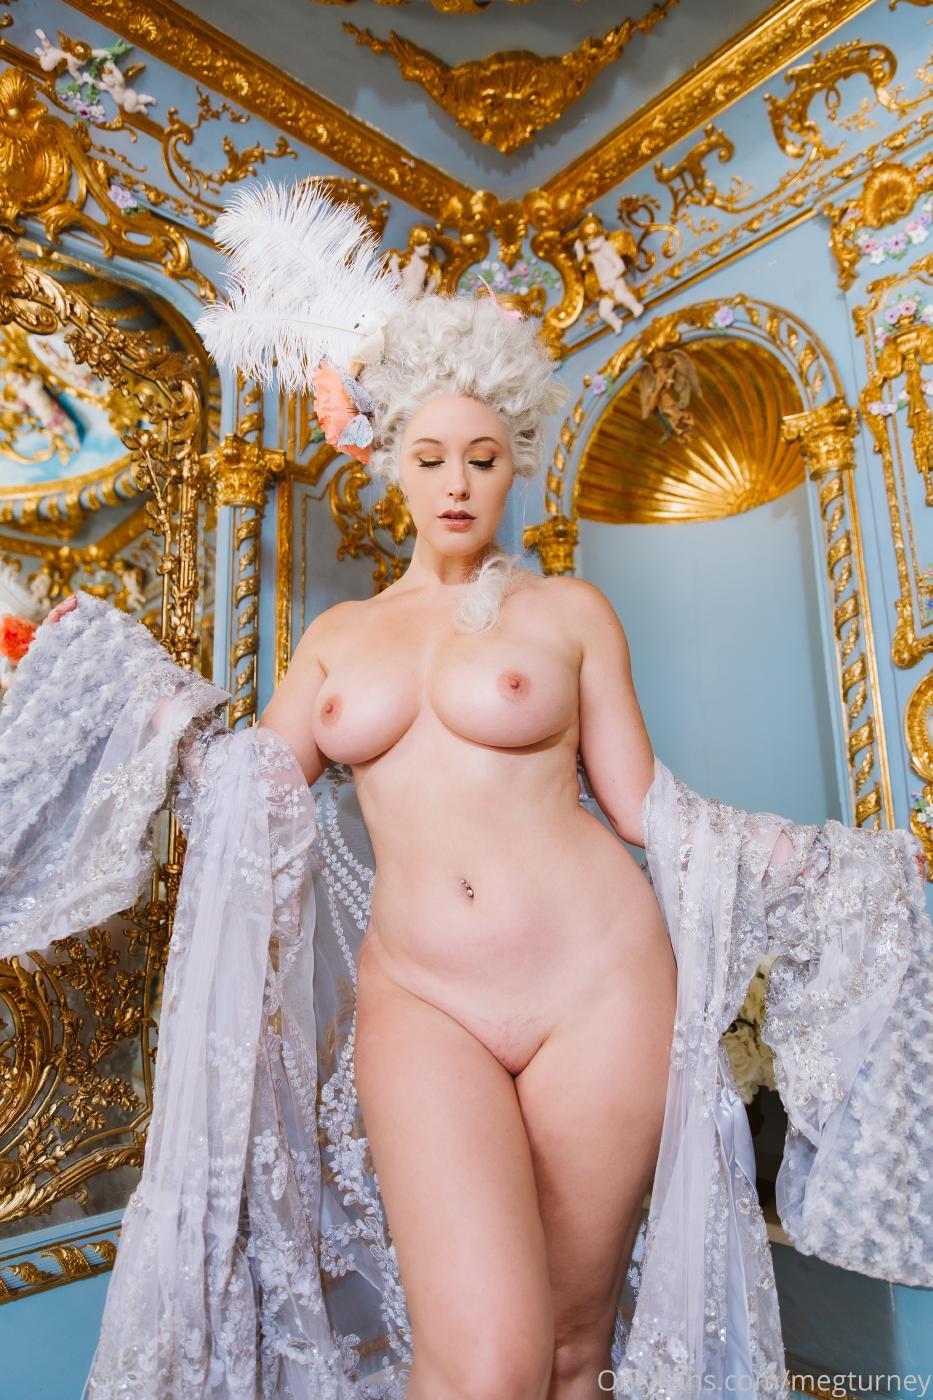 Meg Turney Nude Pussy Marie Antoinette Cosplay Onlyfans Set Leaked Xjvxph